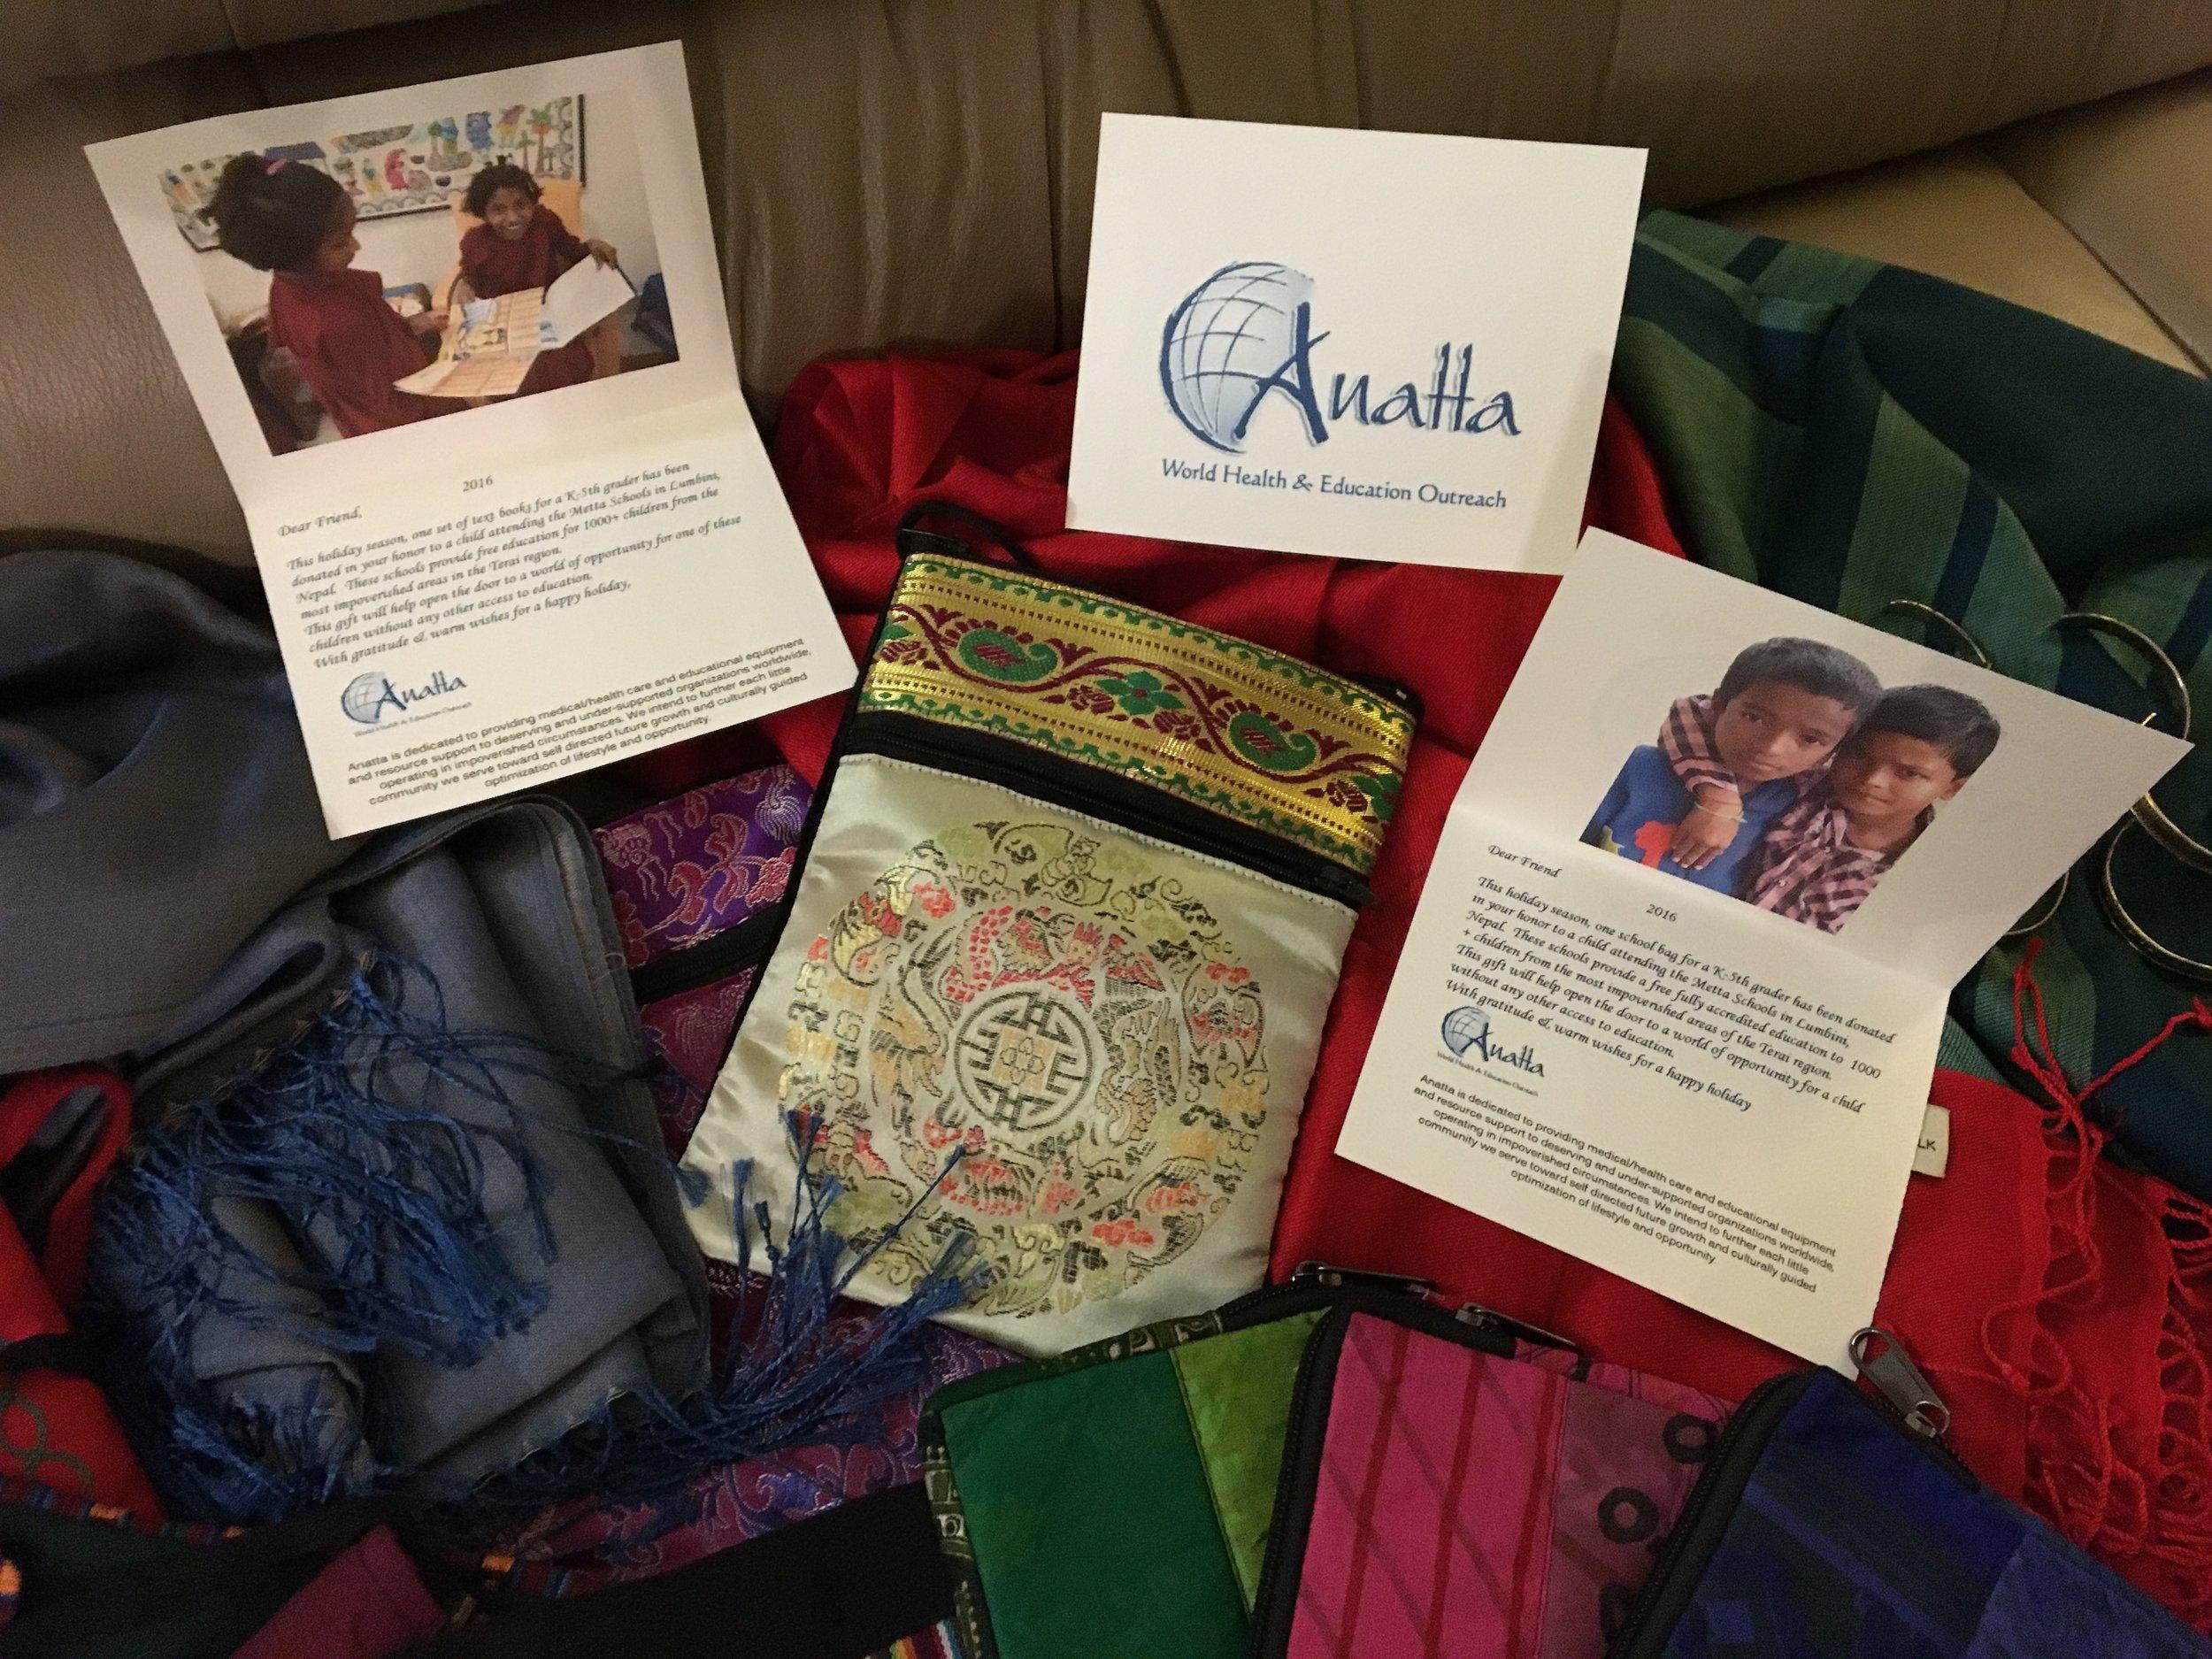 Anatta Honor Cards